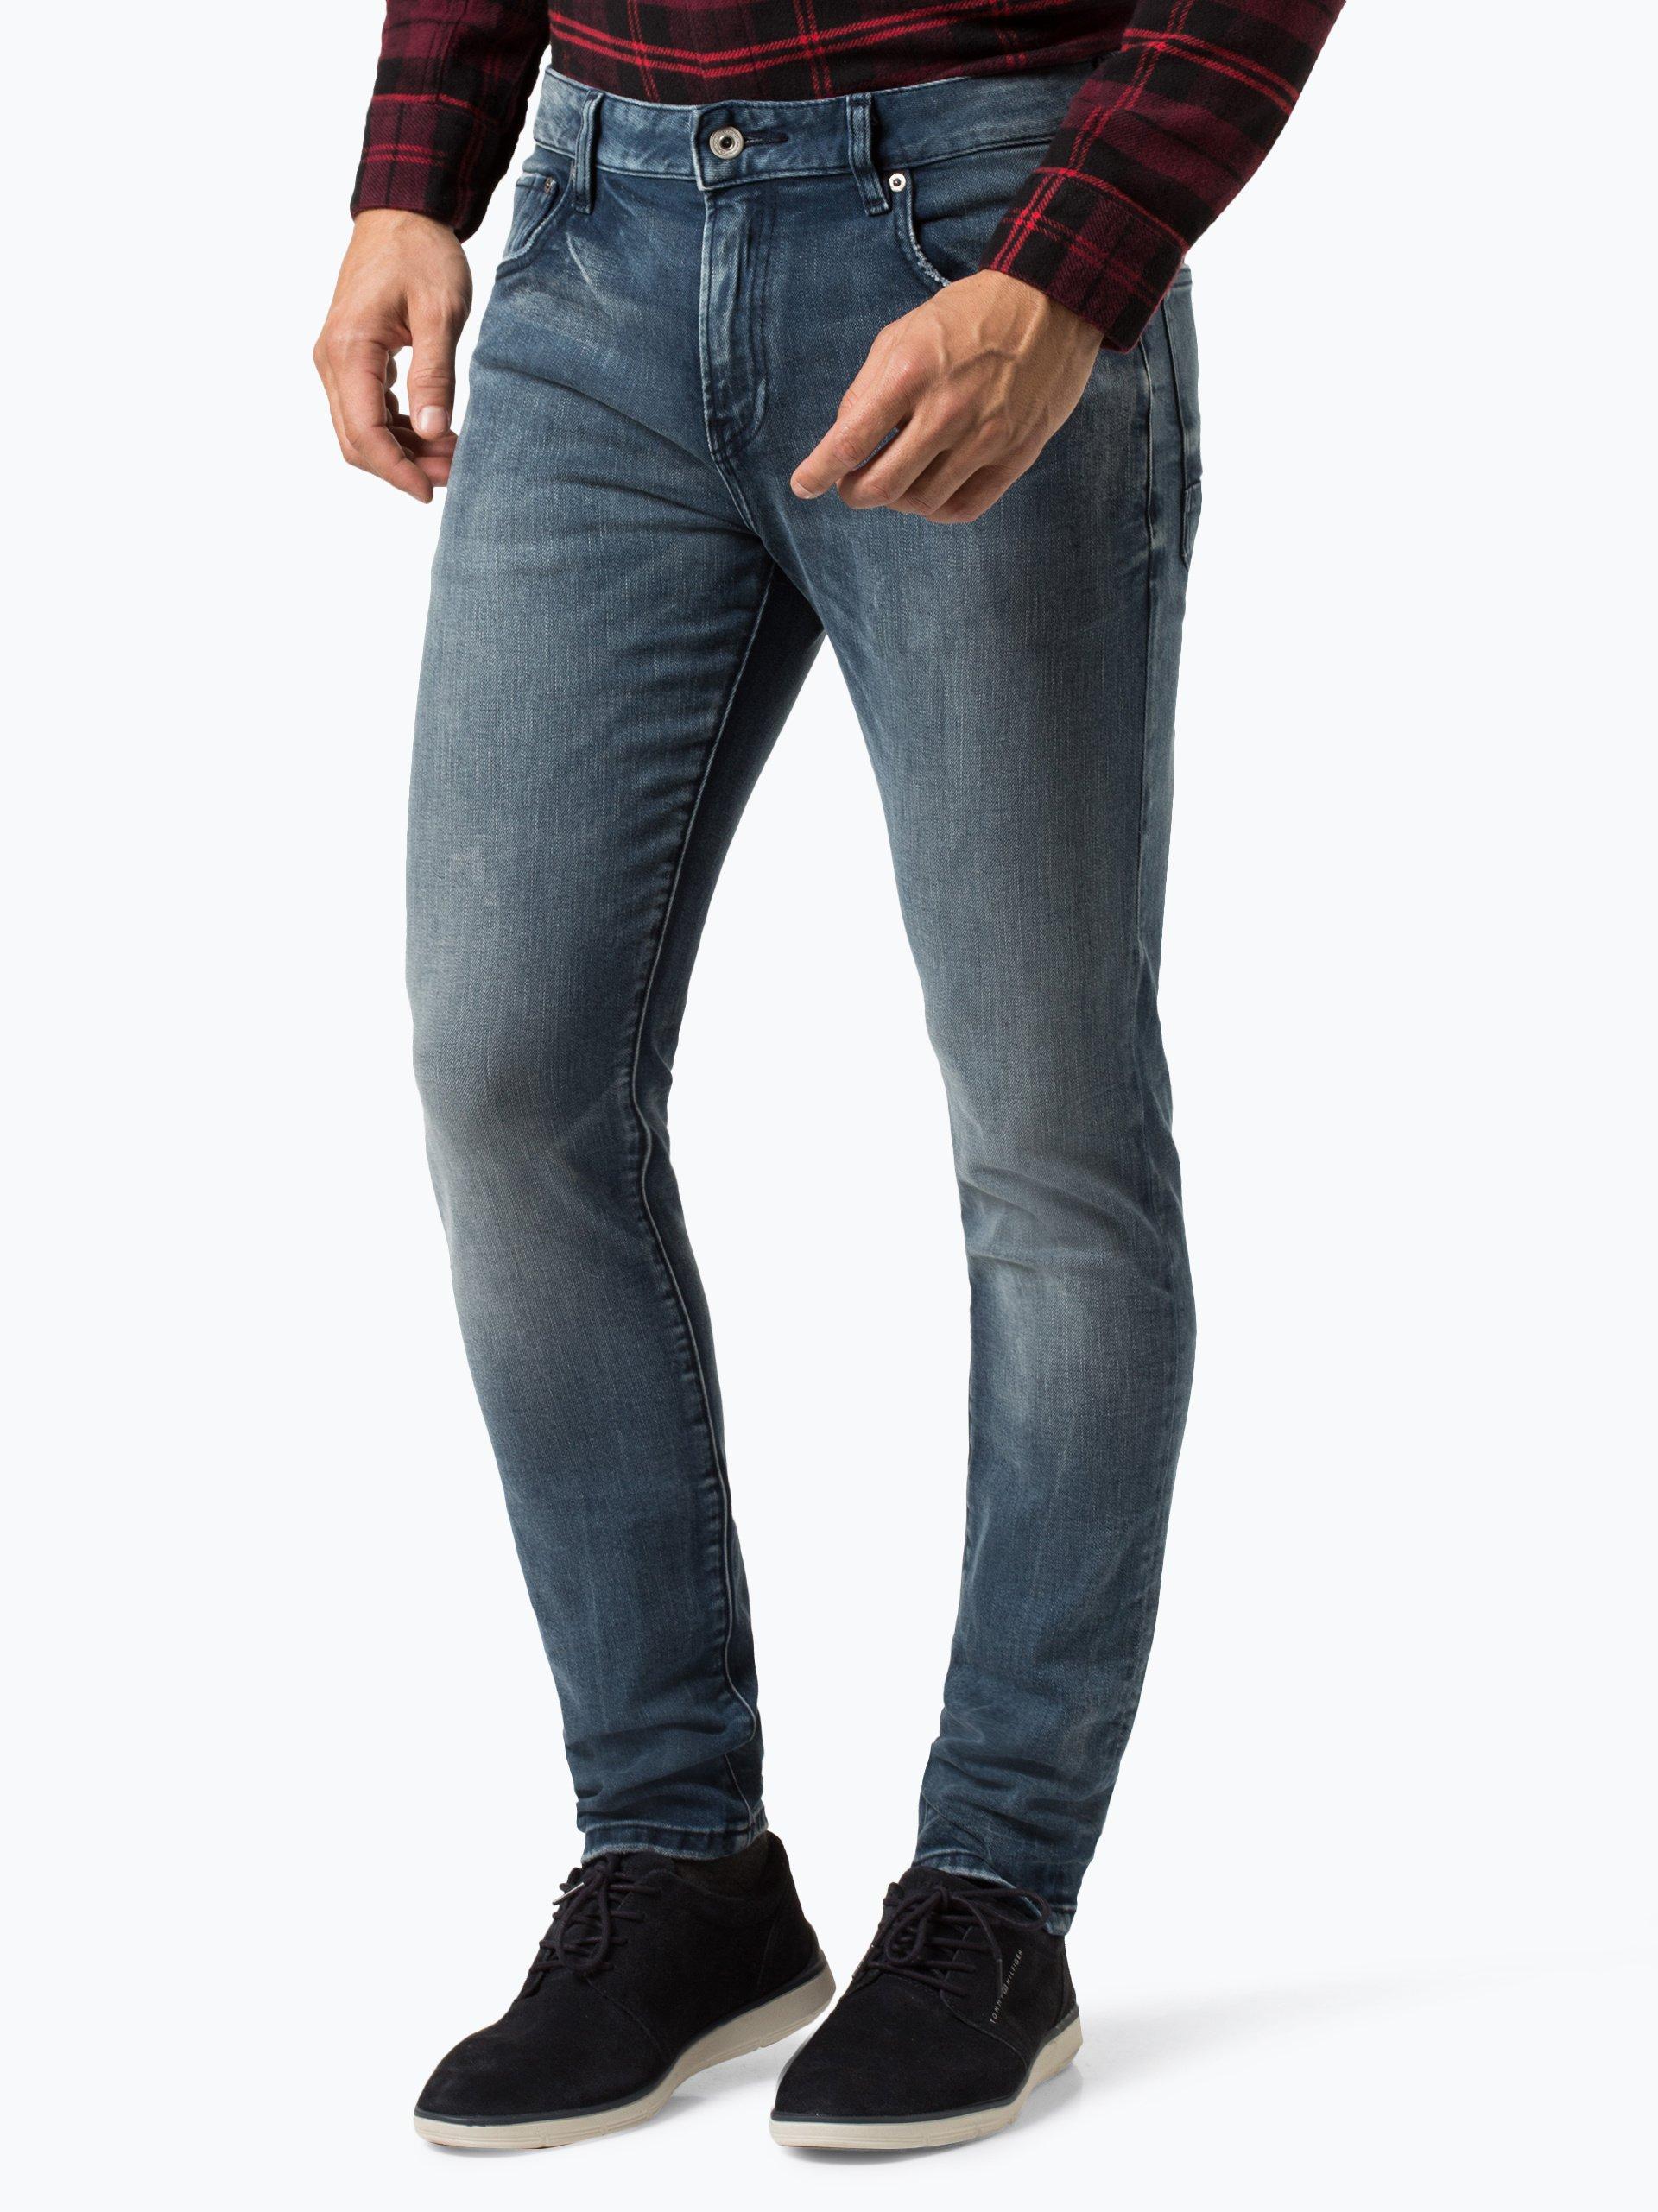 Scotch & Soda Herren Jeans - Skim